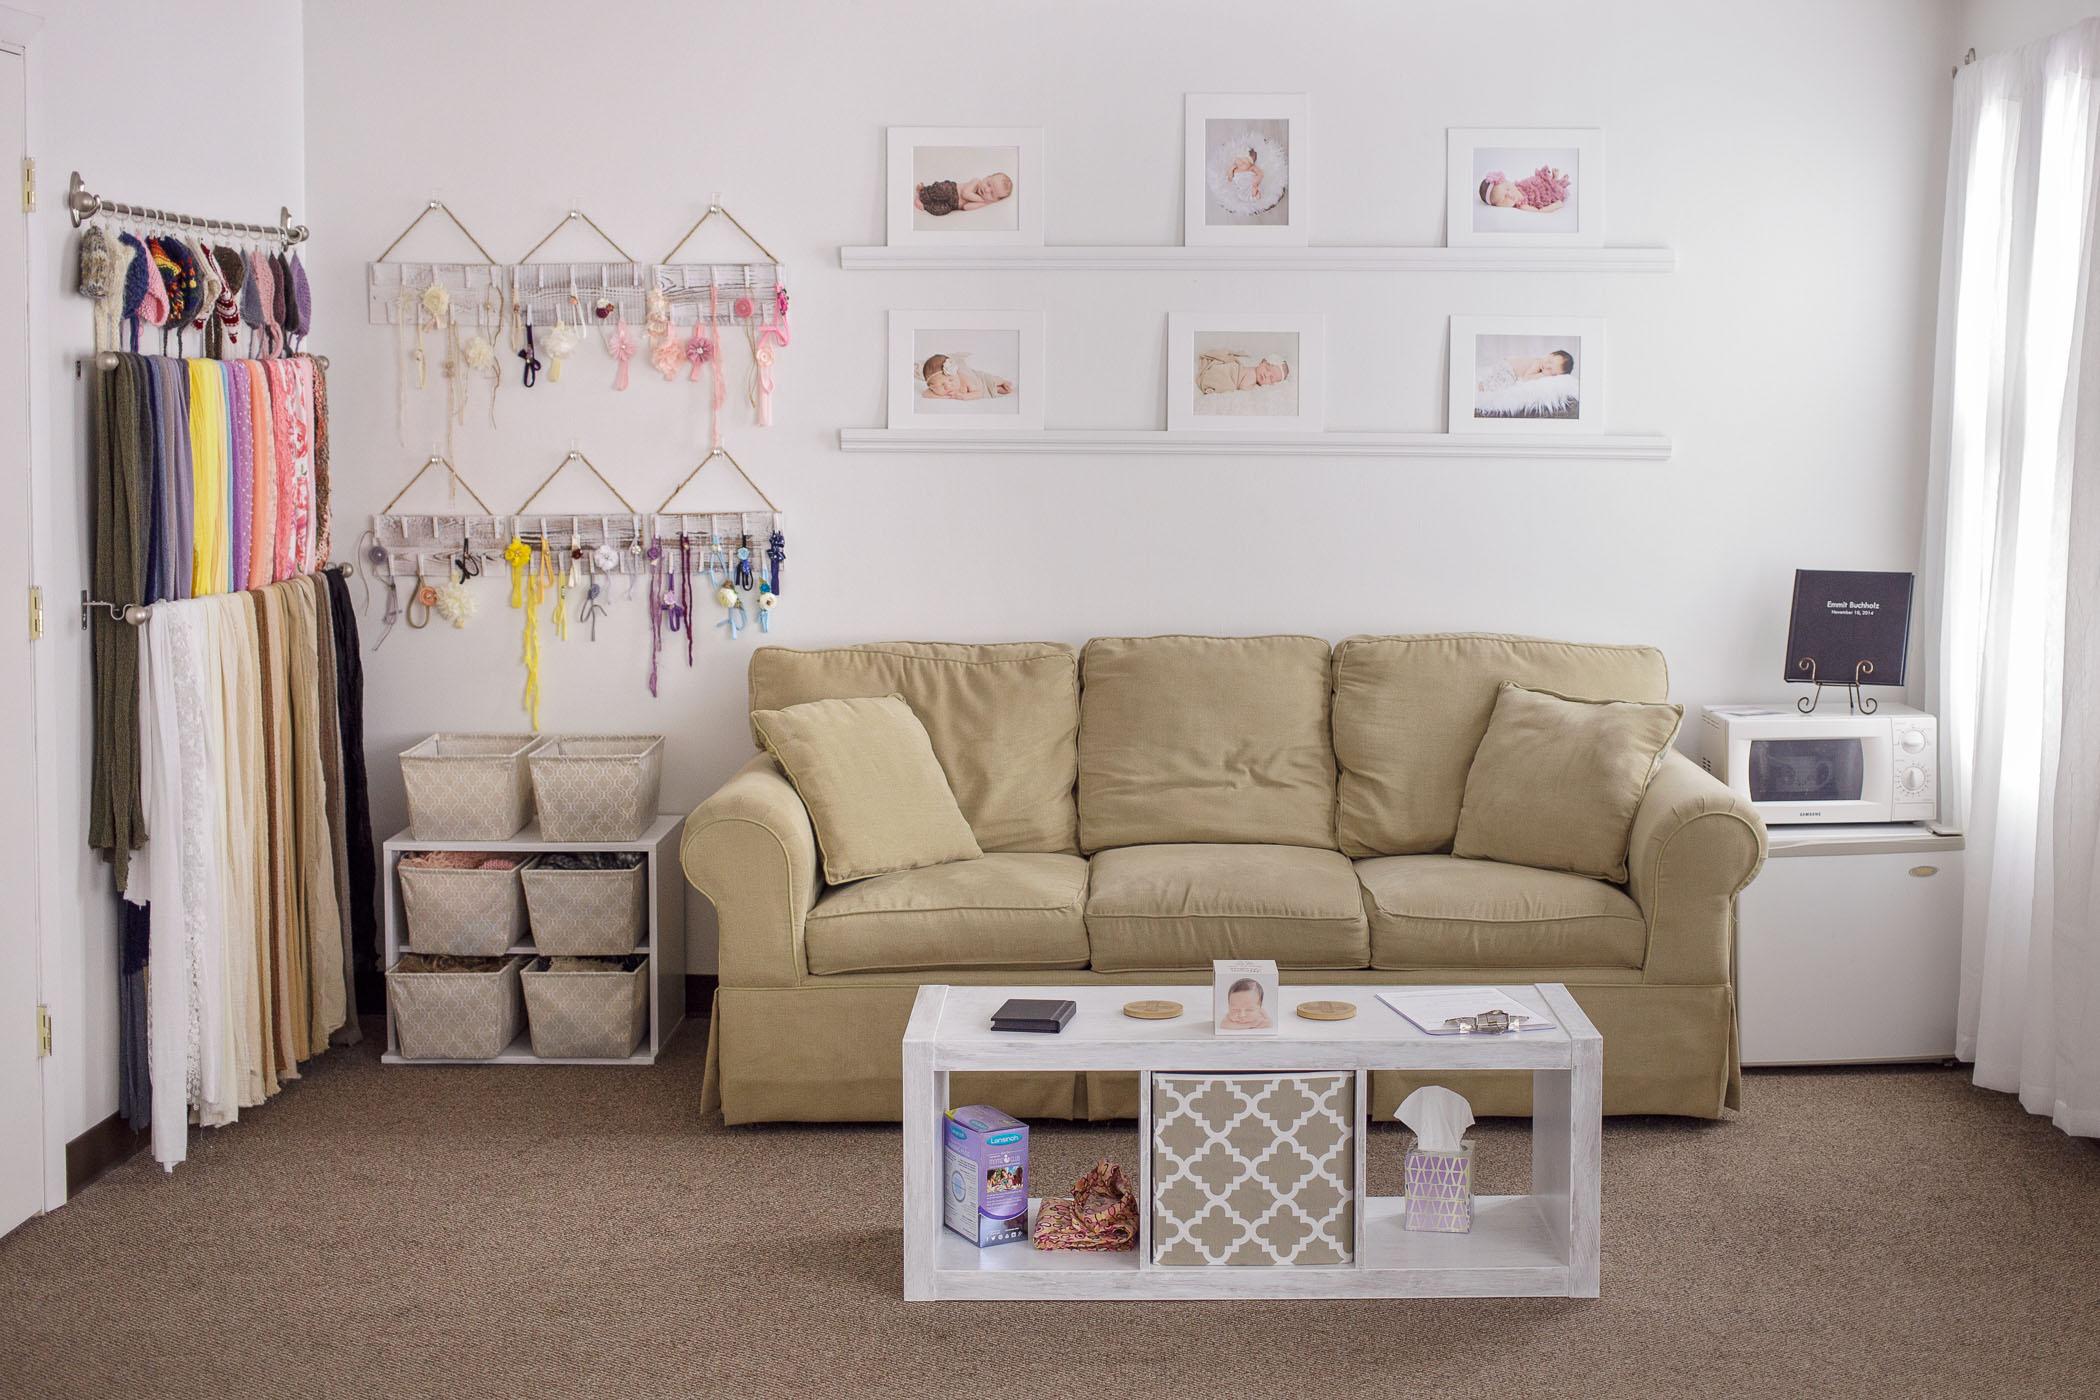 Toledo Newborn Photography Studio in Perrysburg